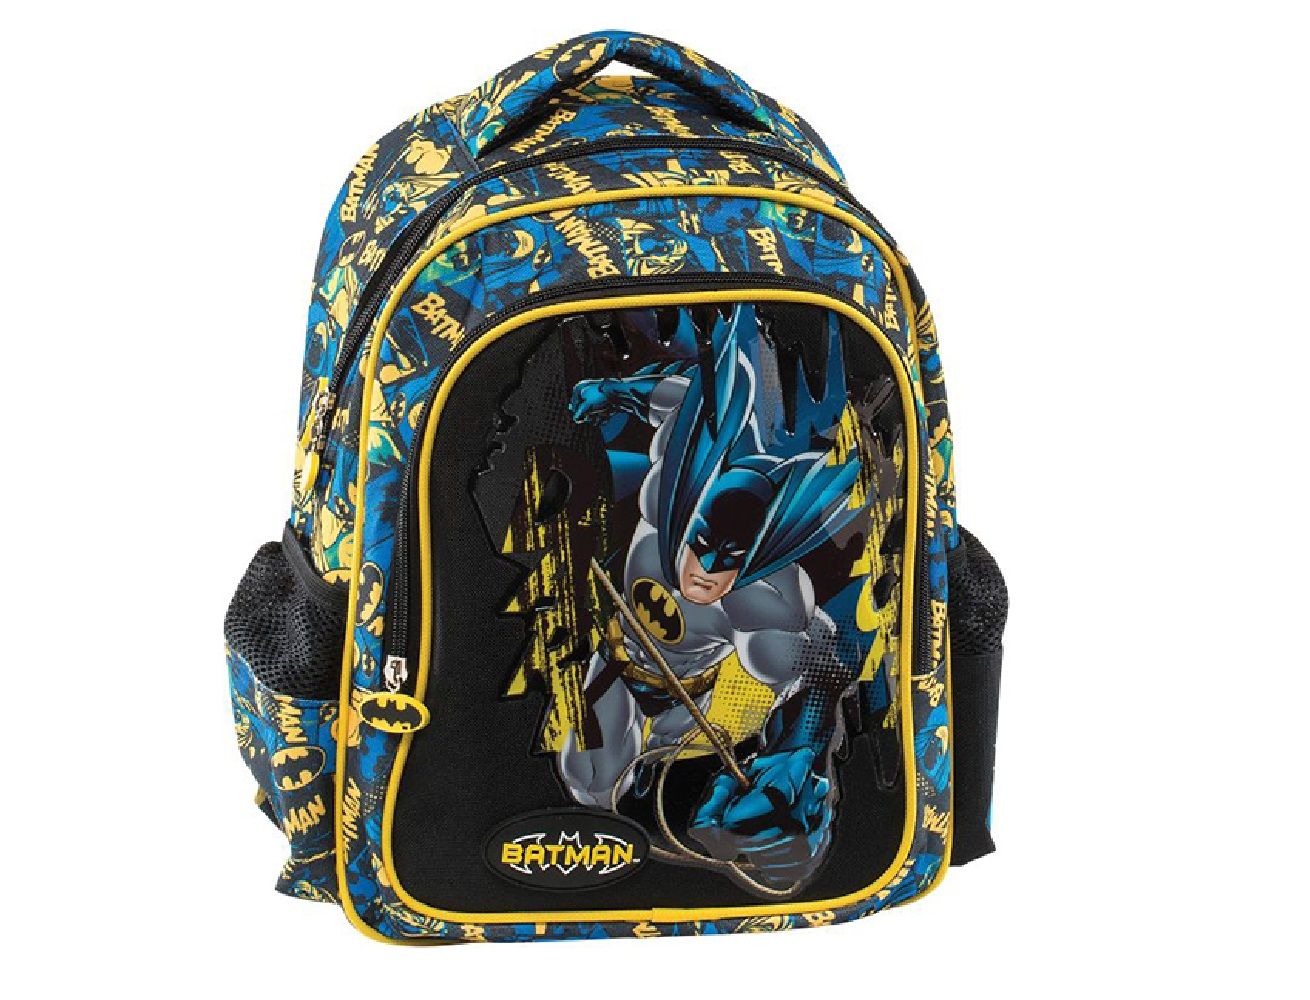 4e16cd1fe56 Τσάντα Πλάτης Νηπιαγωγείου Batman - Graffiti - Lexicon Shop